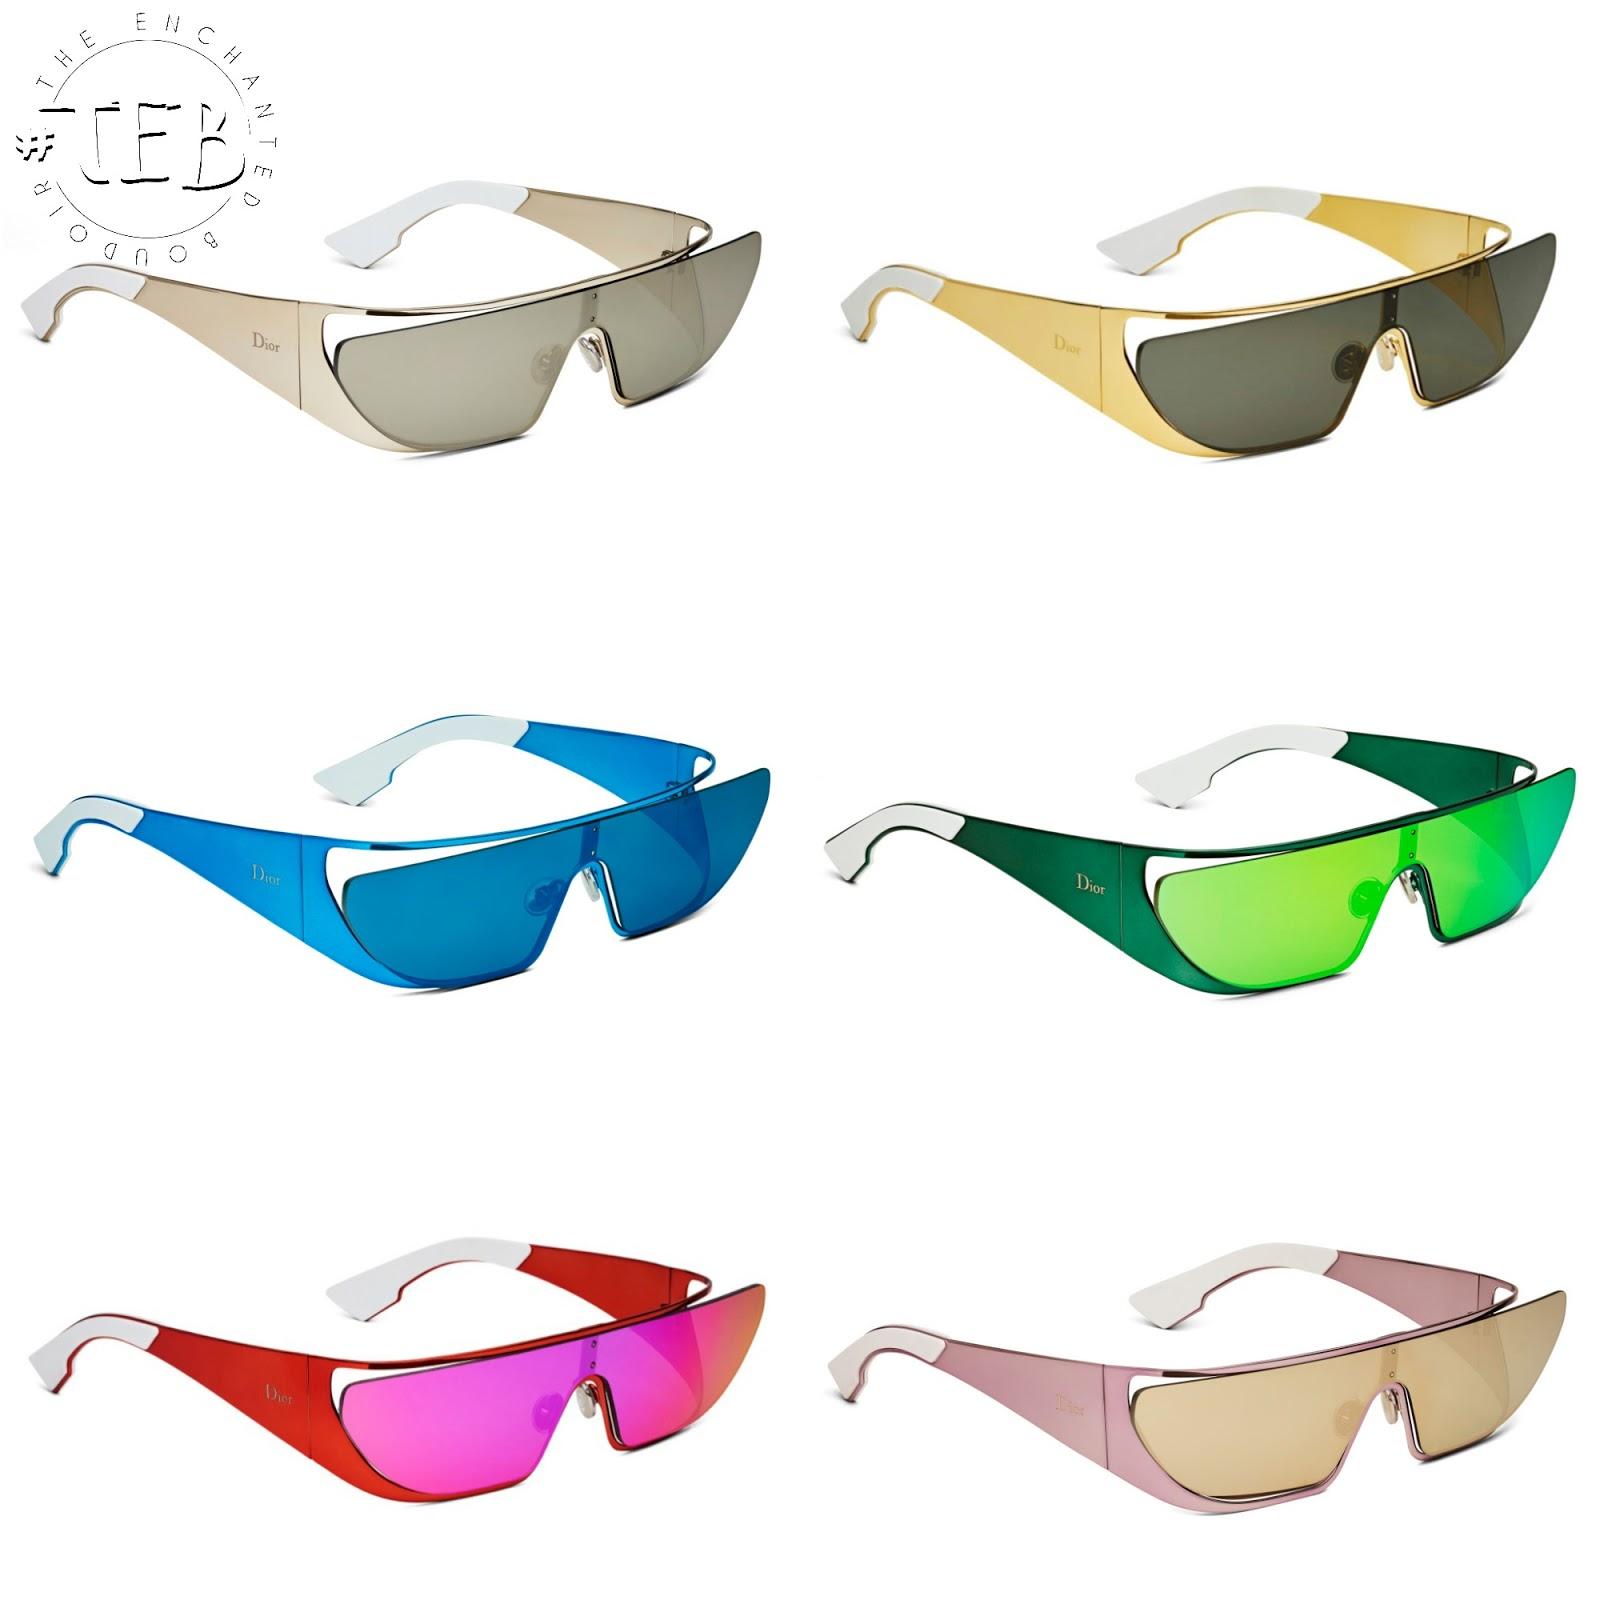 ac3647f424ddc Rihanna x Dior  sunglasses collaboration - Sugareal